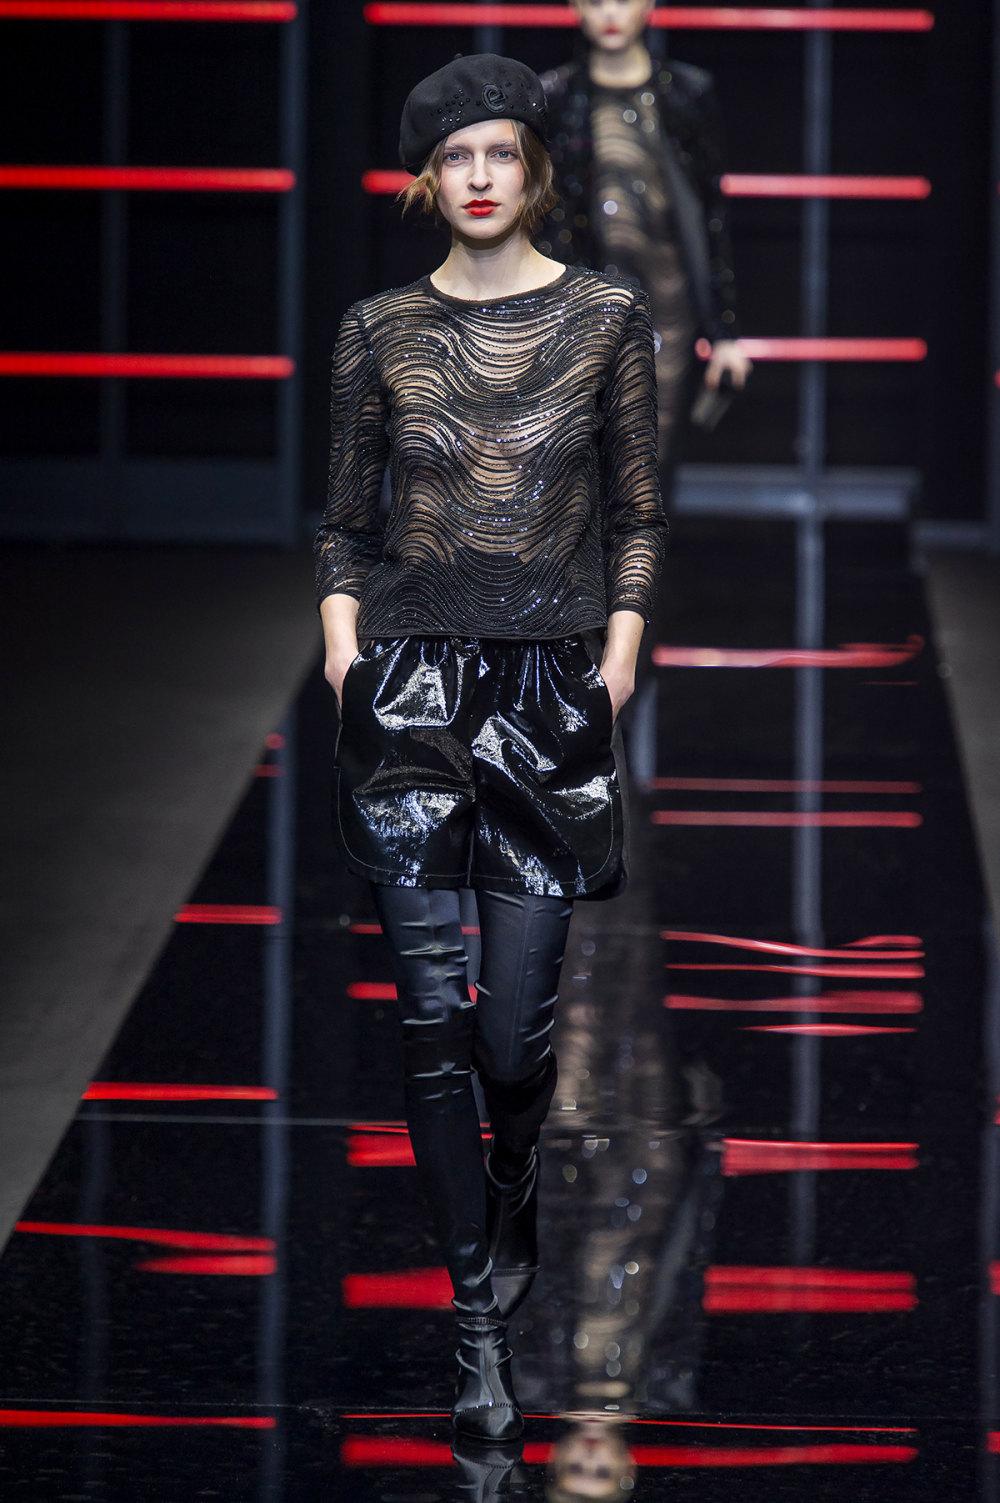 Emporio Armani时装系列畅的裤子带有柔滑裙子的鸡尾酒礼服-49.jpg